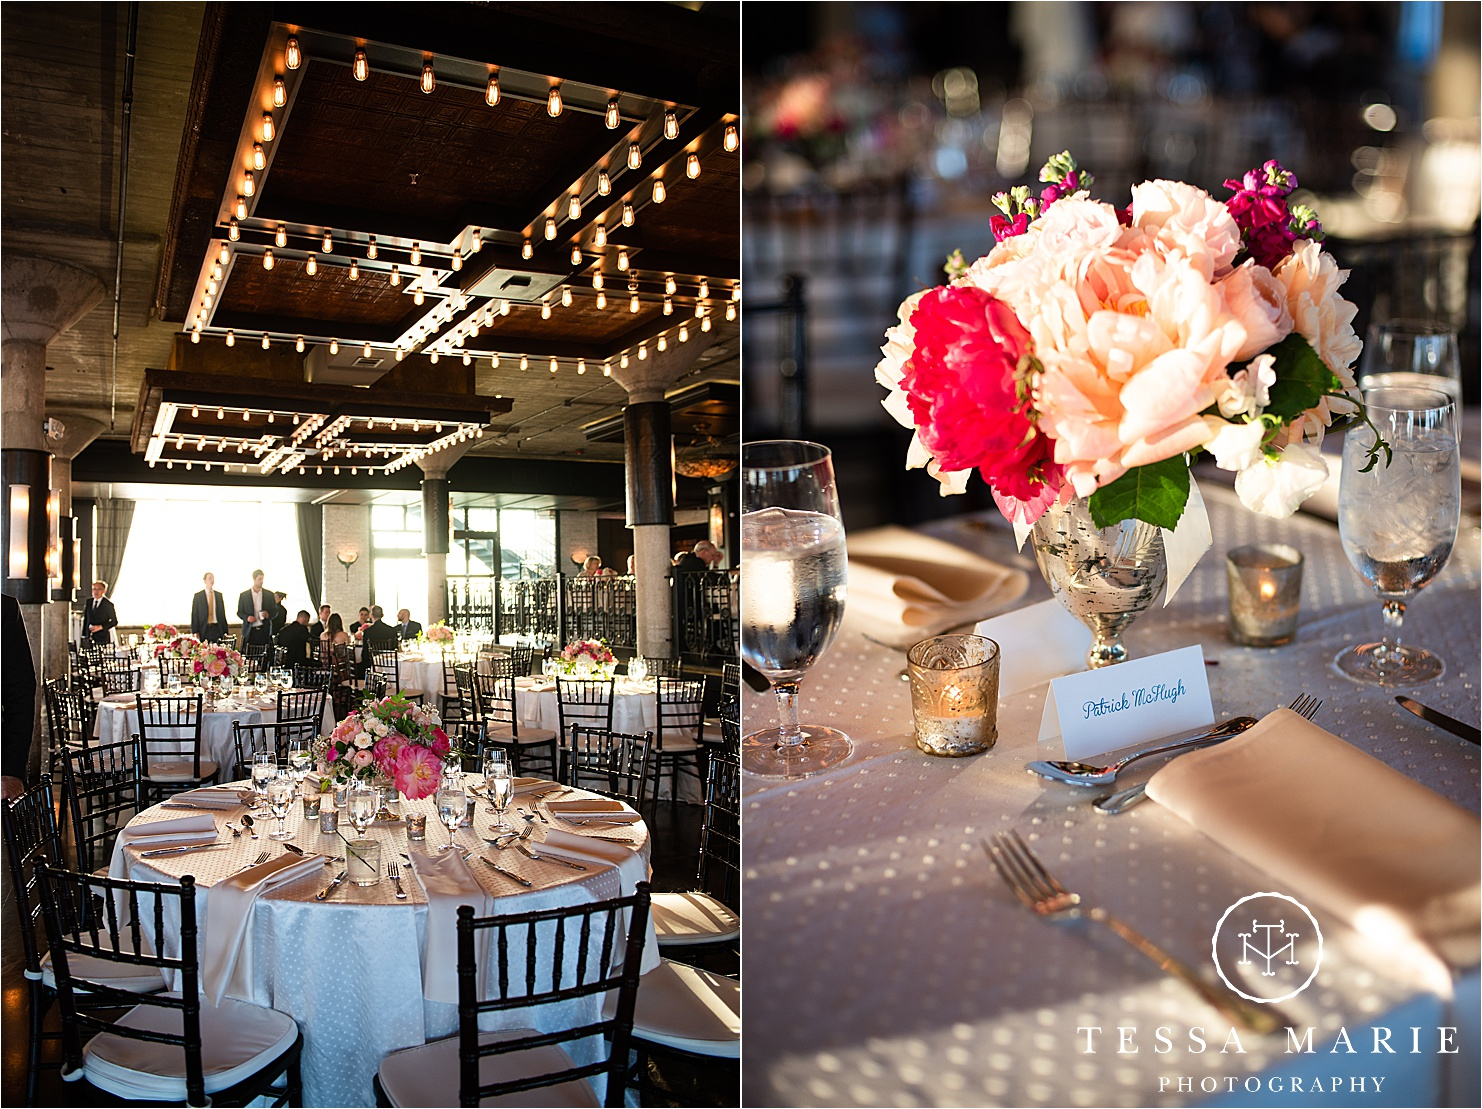 Tessa_marie_weddings_houston_wedding_photographer_The_astorian_0144.jpg